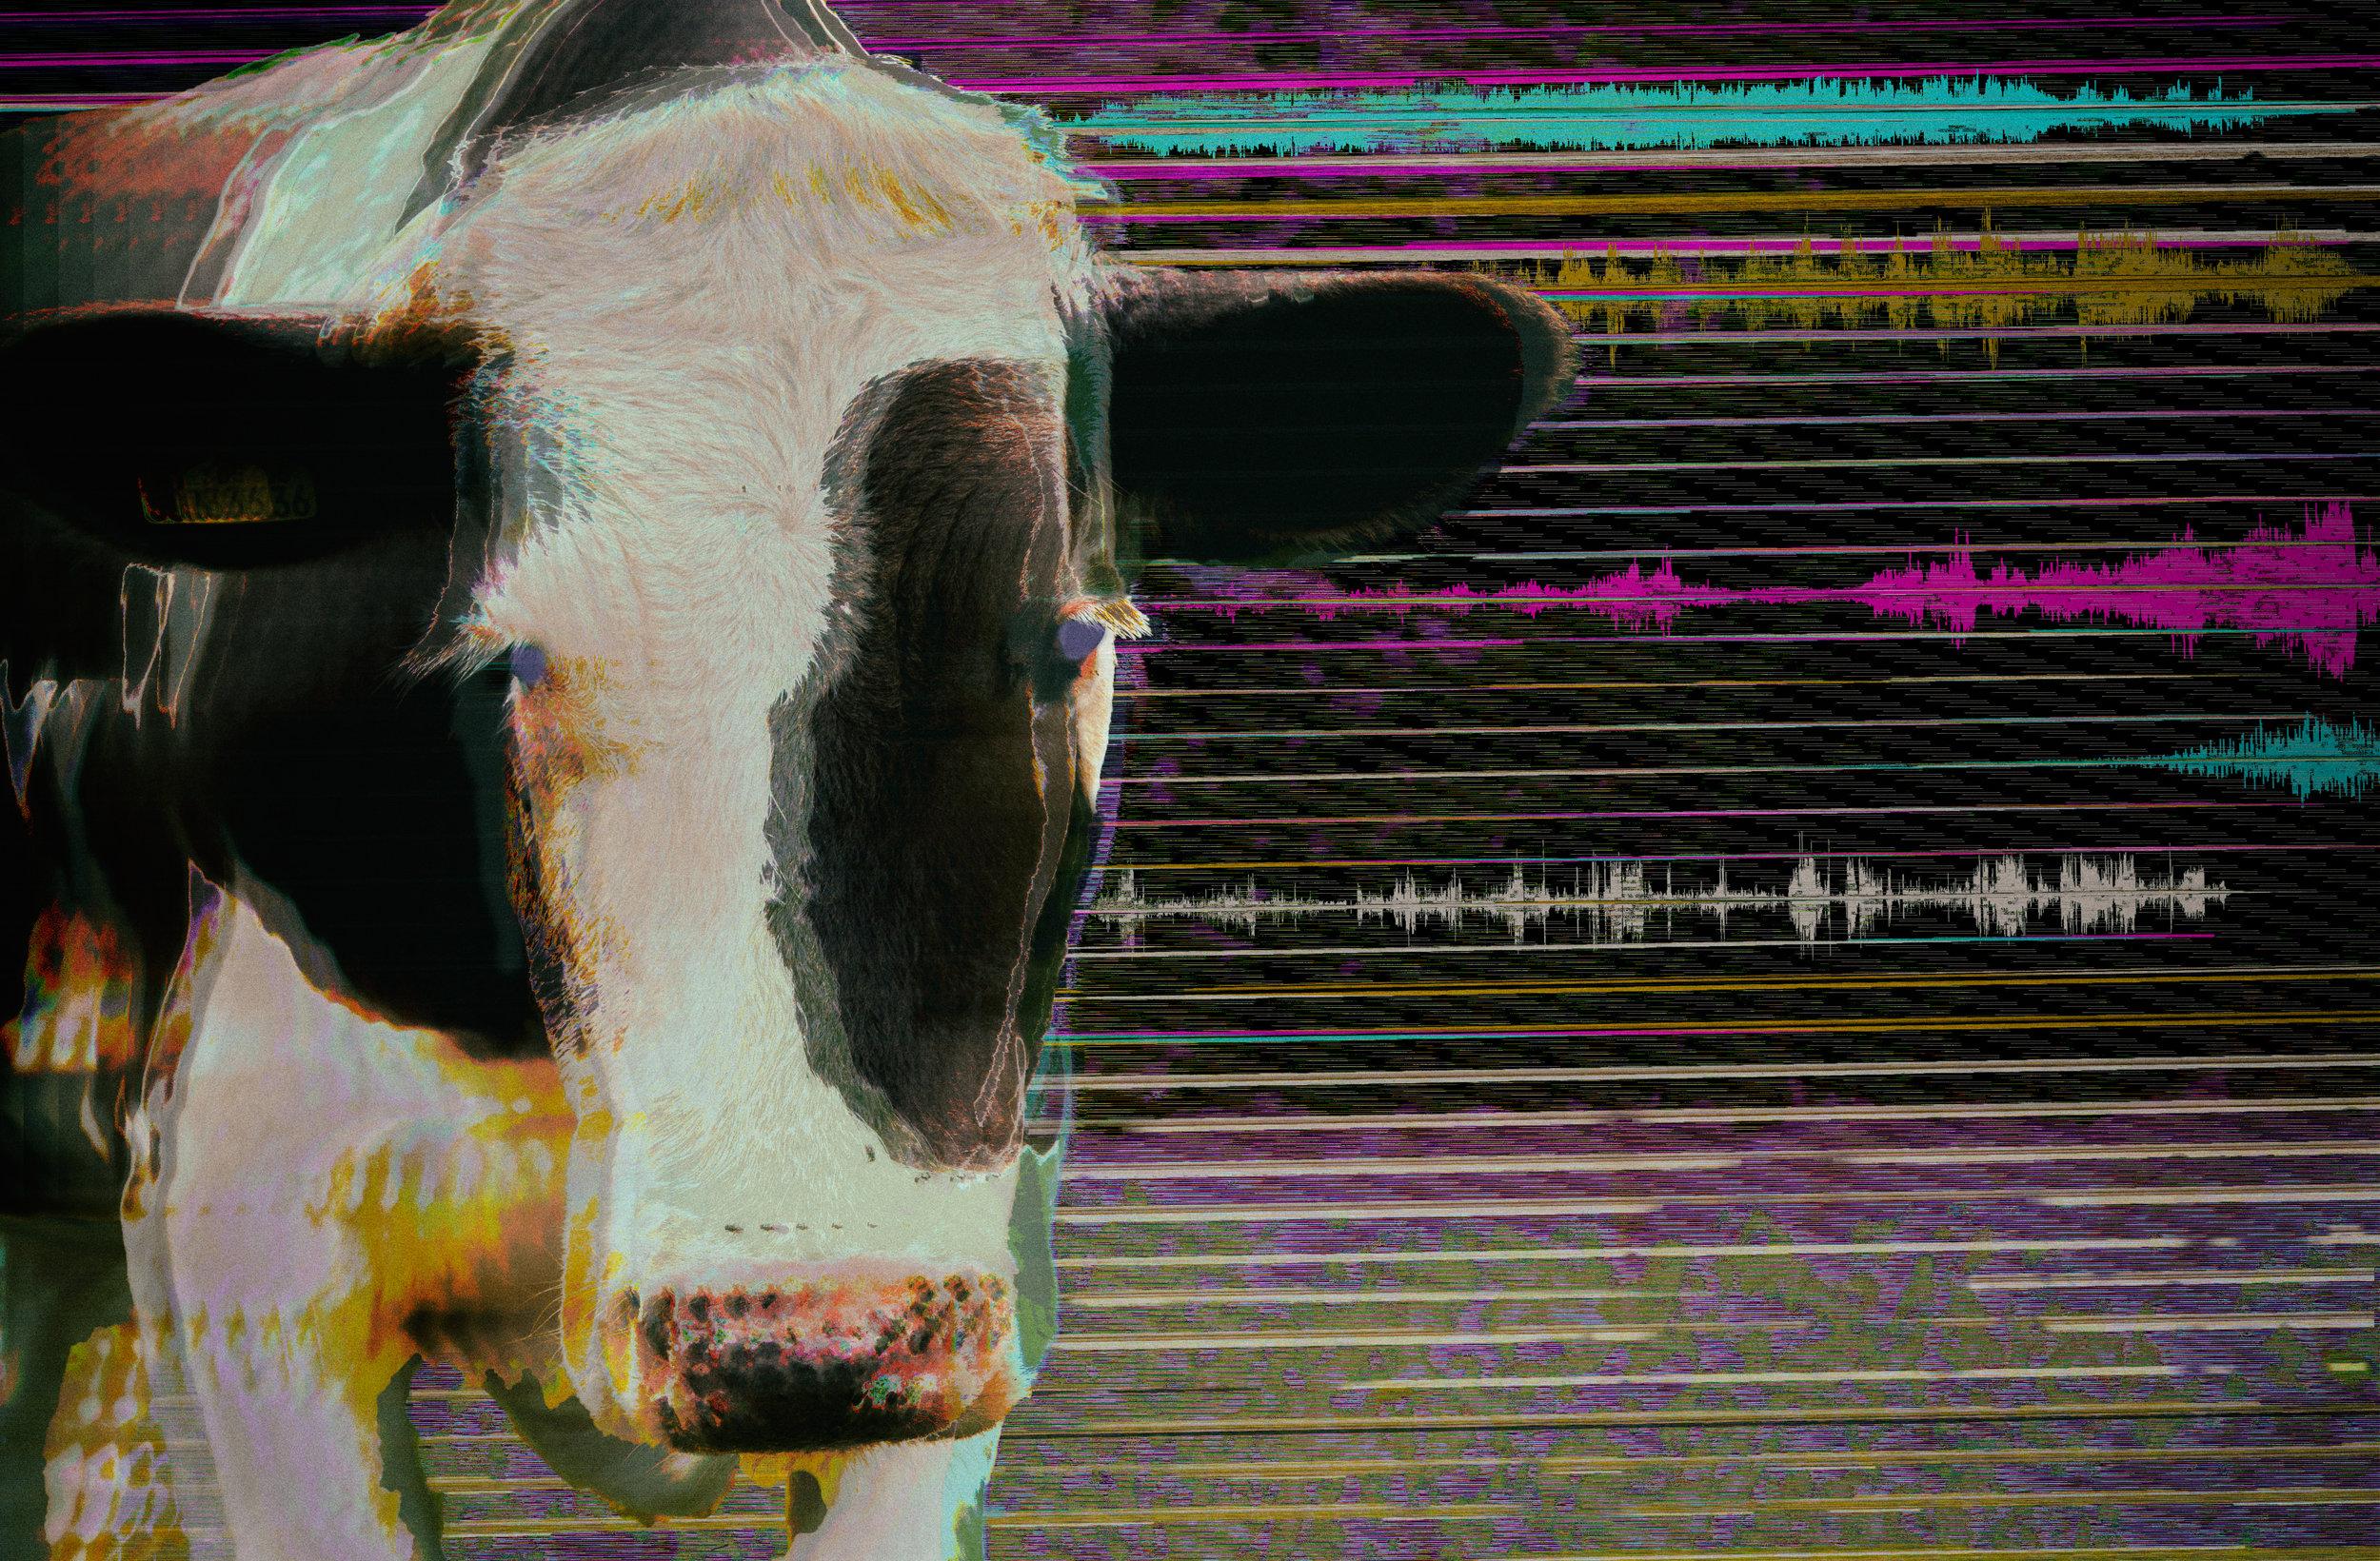 cow_waveform3.jpg